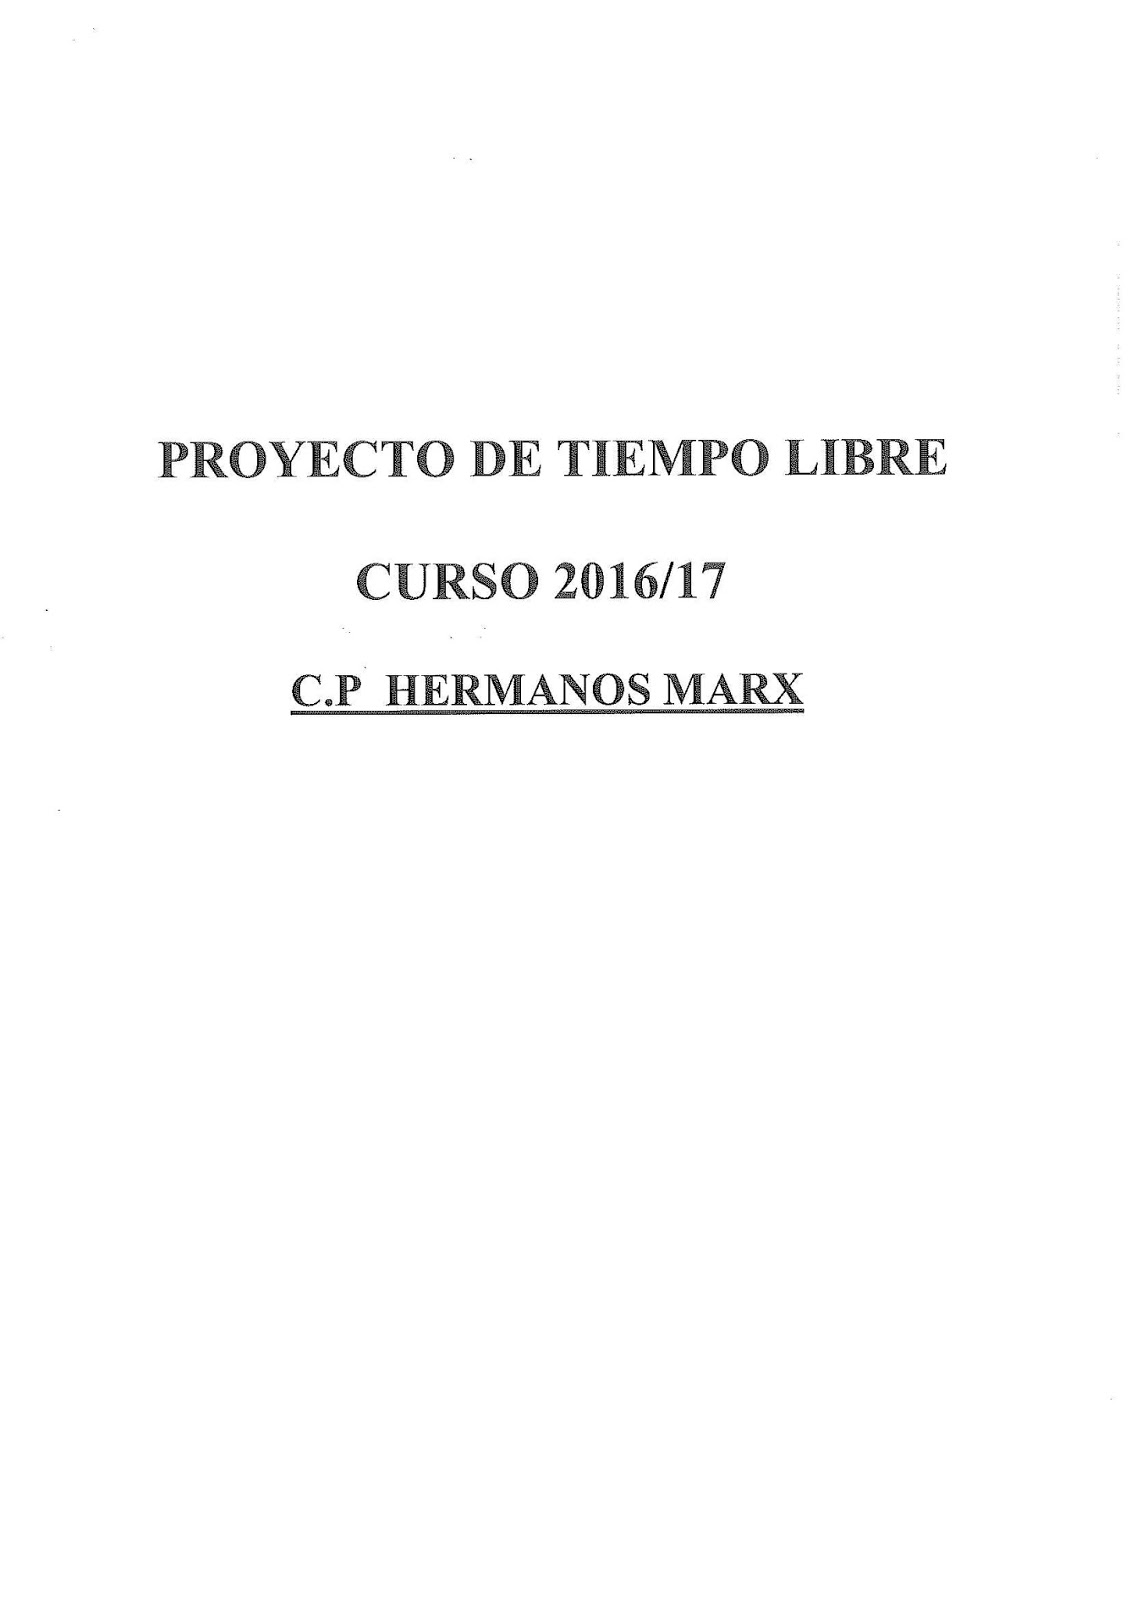 Ampa hermanos marx reuni n informativa comedor escolar proyecto 16 17 - Proyecto de comedor escolar ...